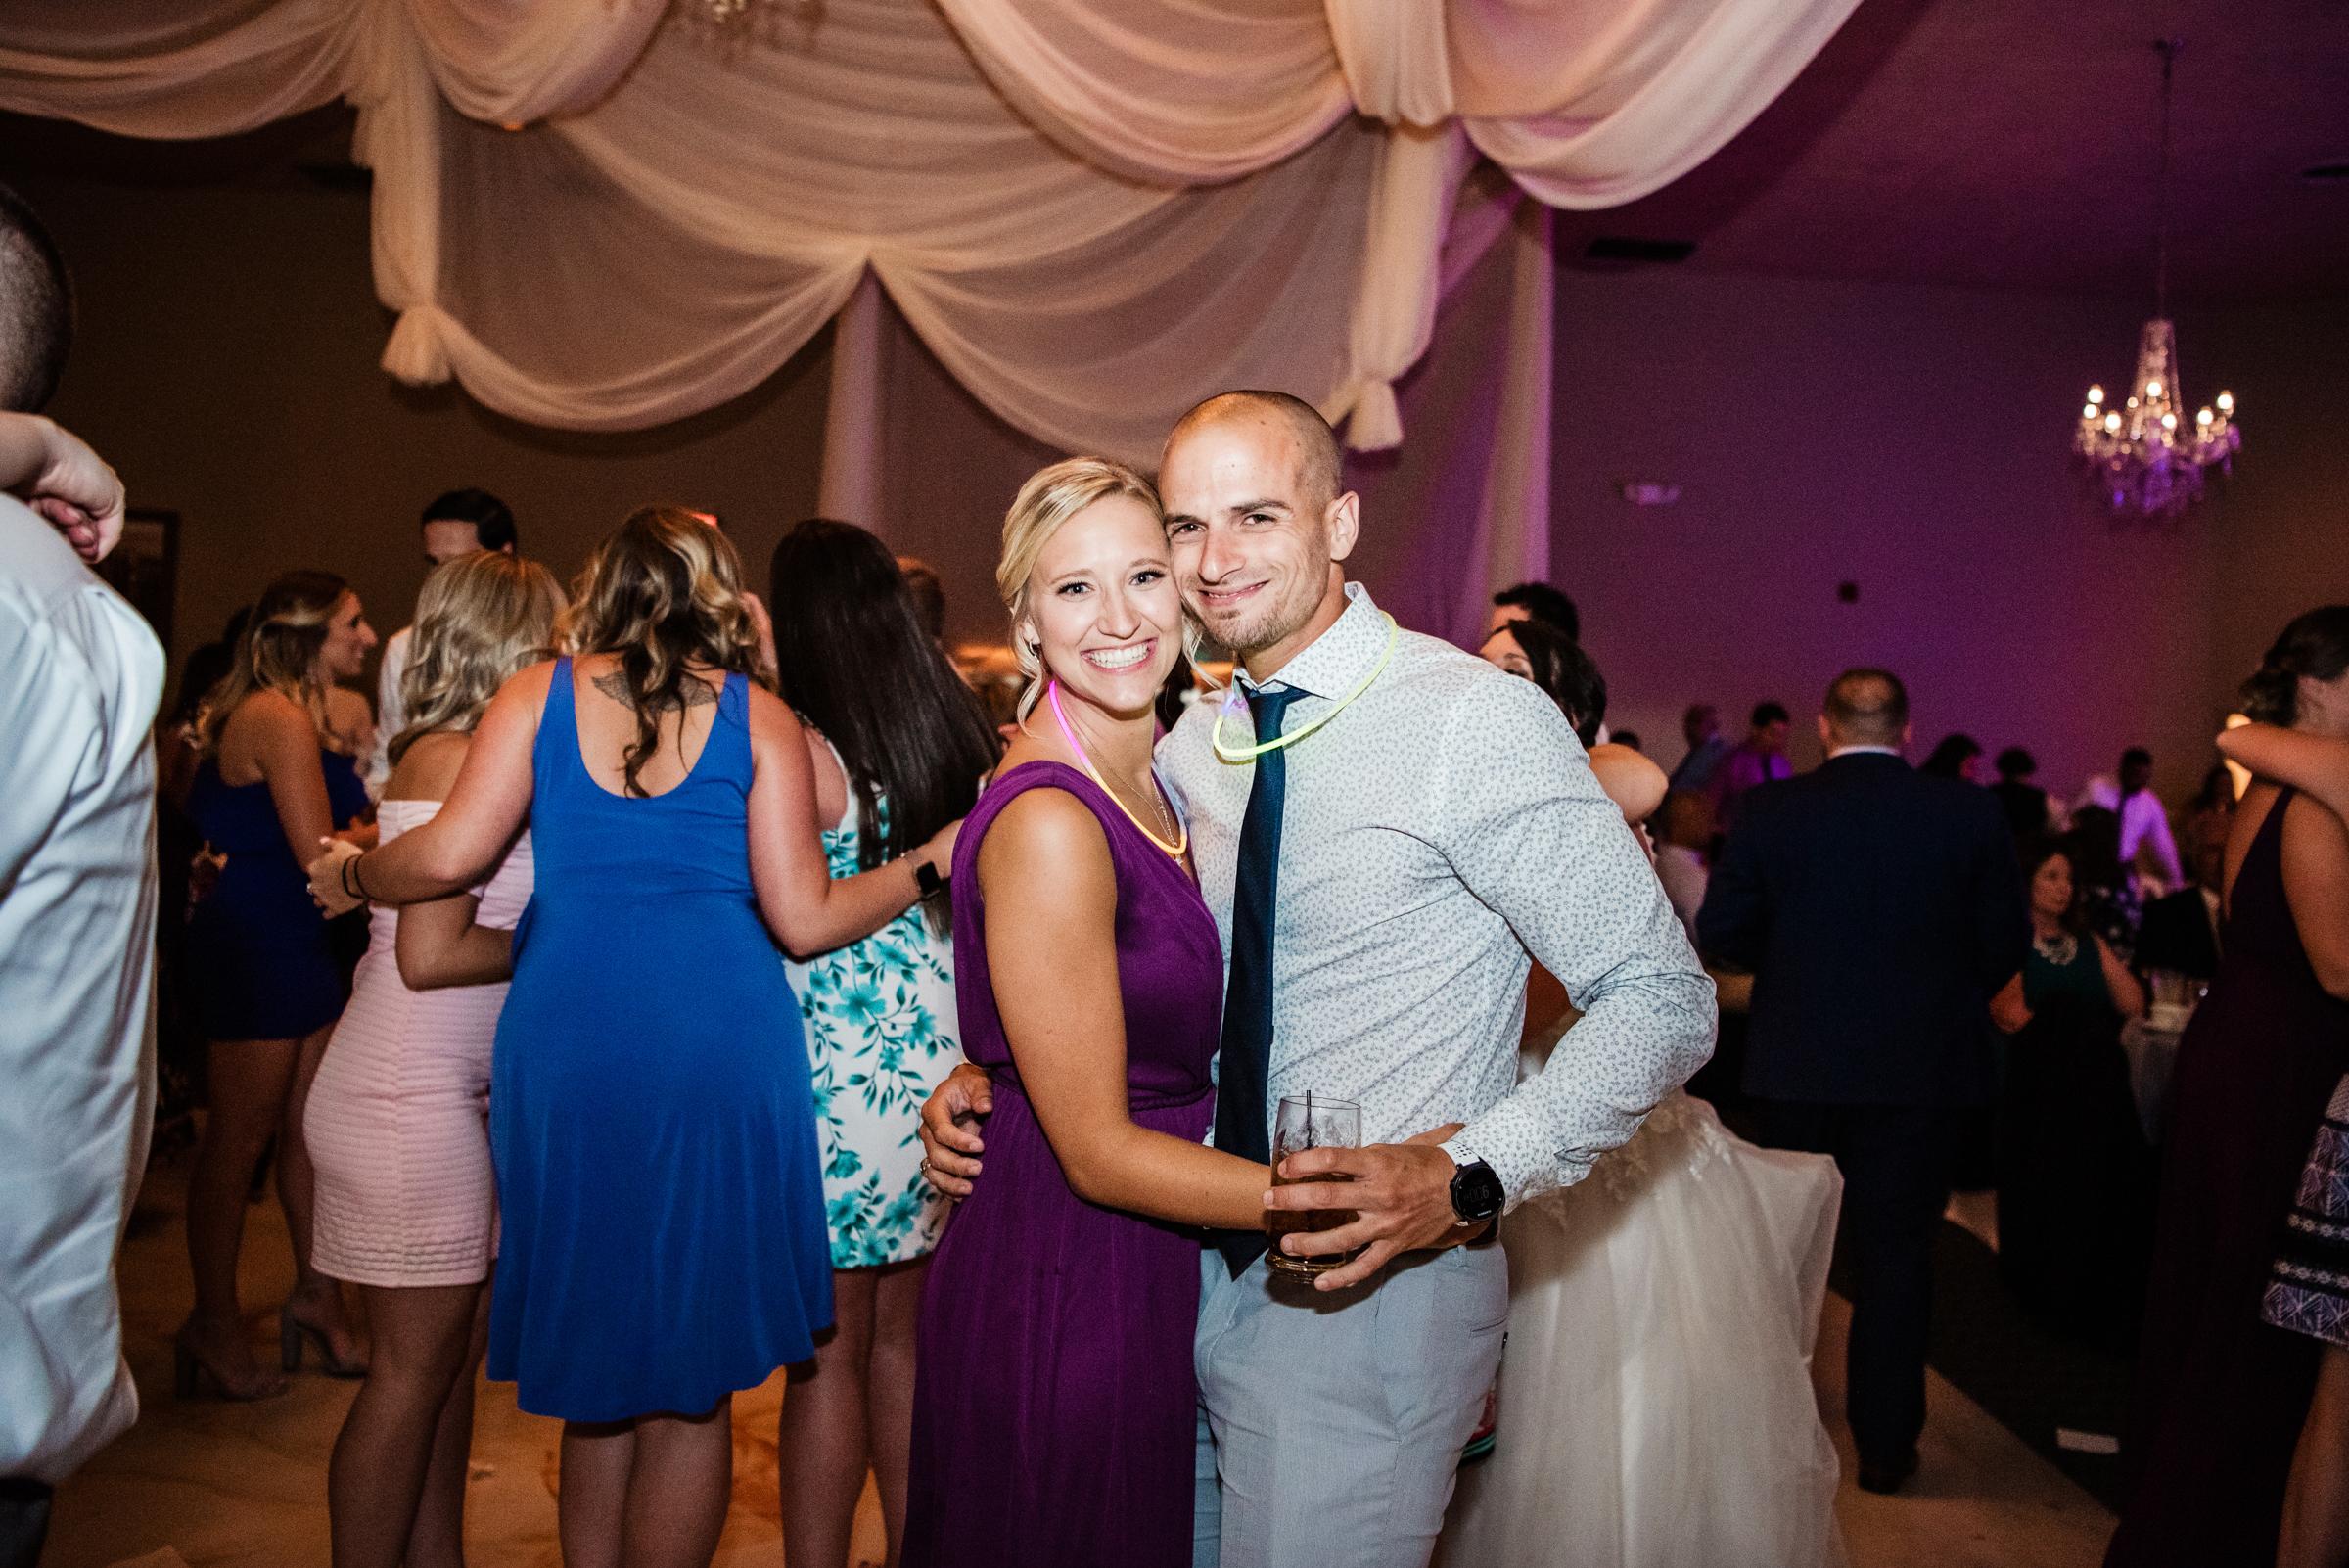 Historic_Old_St_Johns_Church_Valentinos_Banquet_Hall_Central_NY_Wedding_JILL_STUDIO_Rochester_NY_Photographer_DSC_7071.jpg